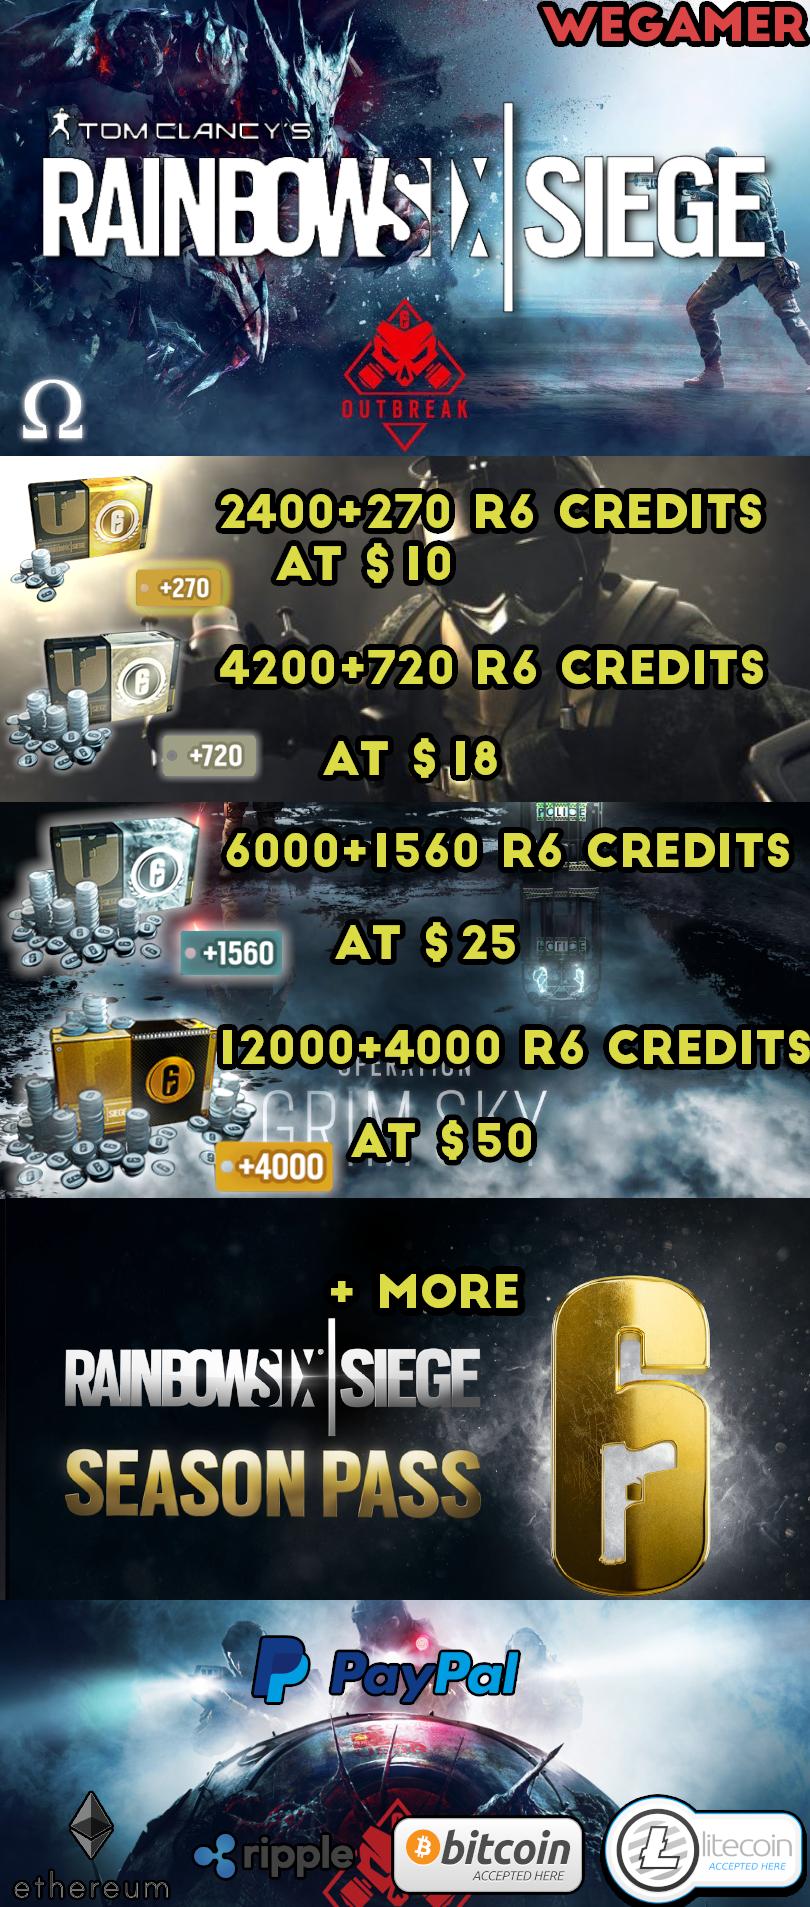 Selling - Rainbow Six Siege PC Credits & season pass & DLC's